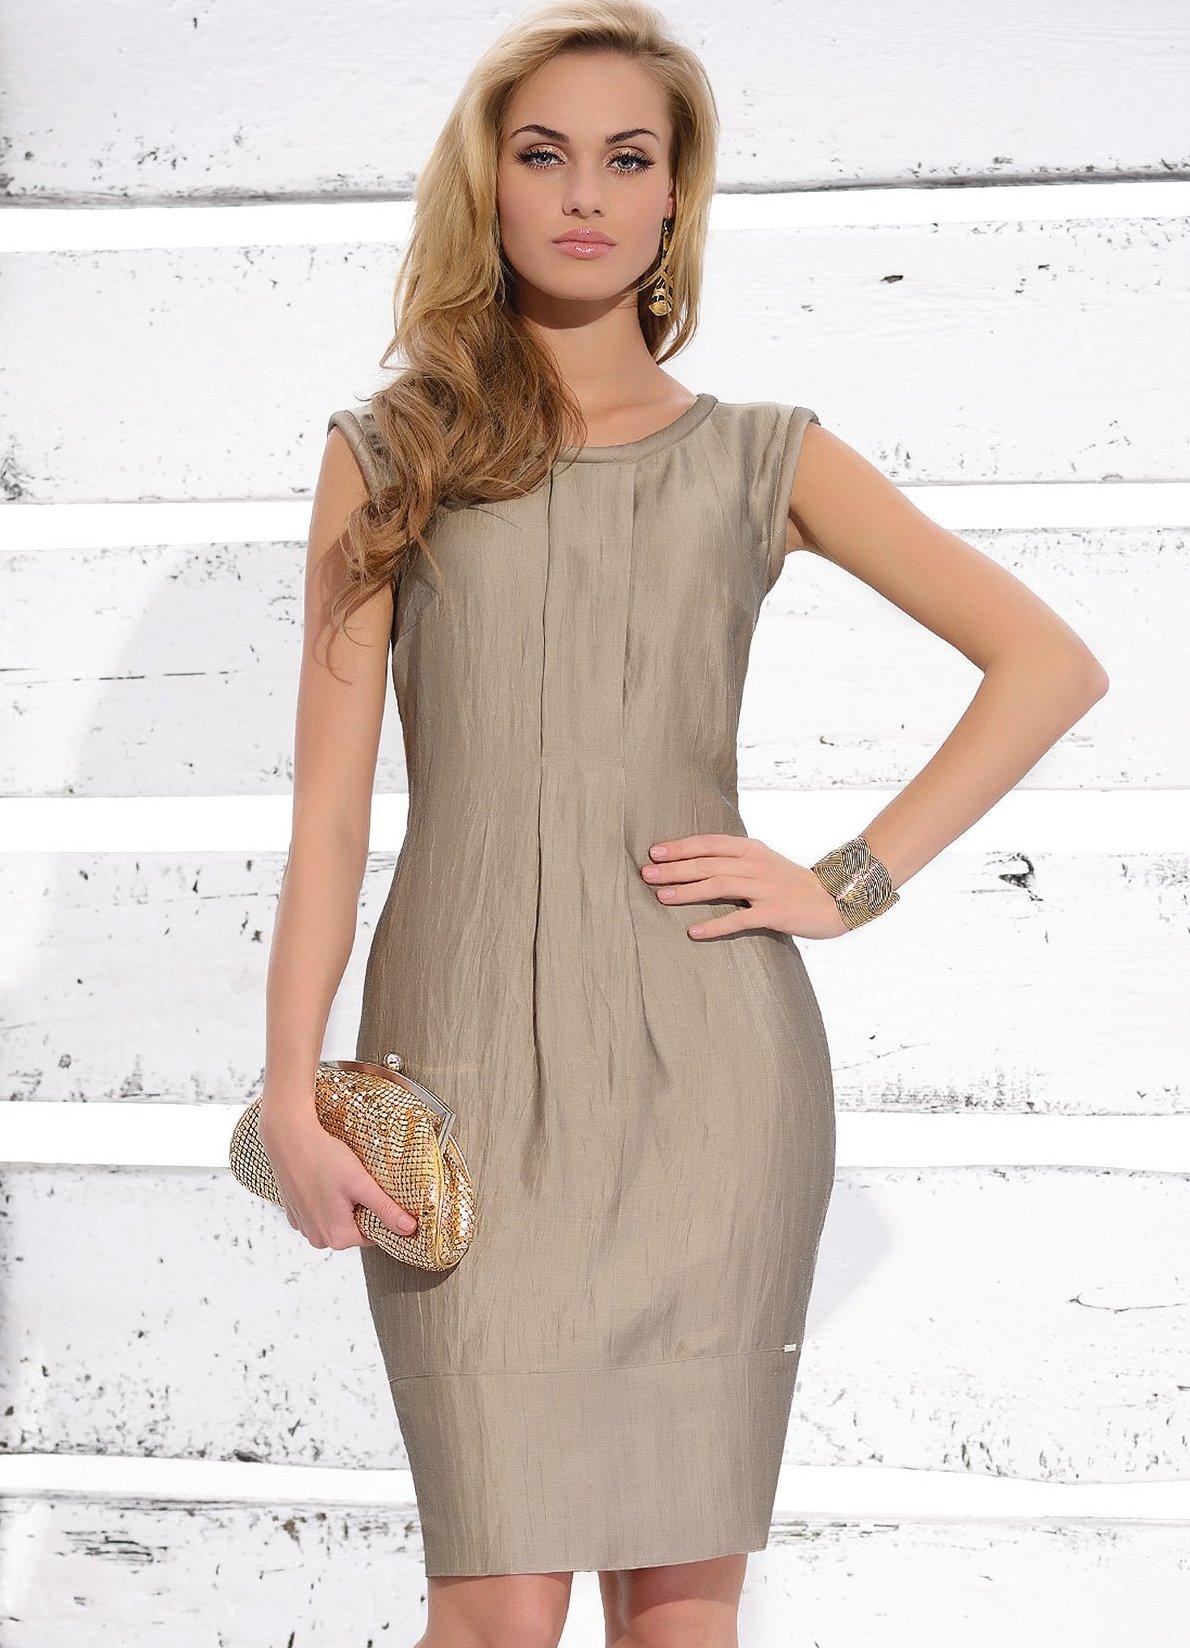 63d992b97 Летние платья из льна